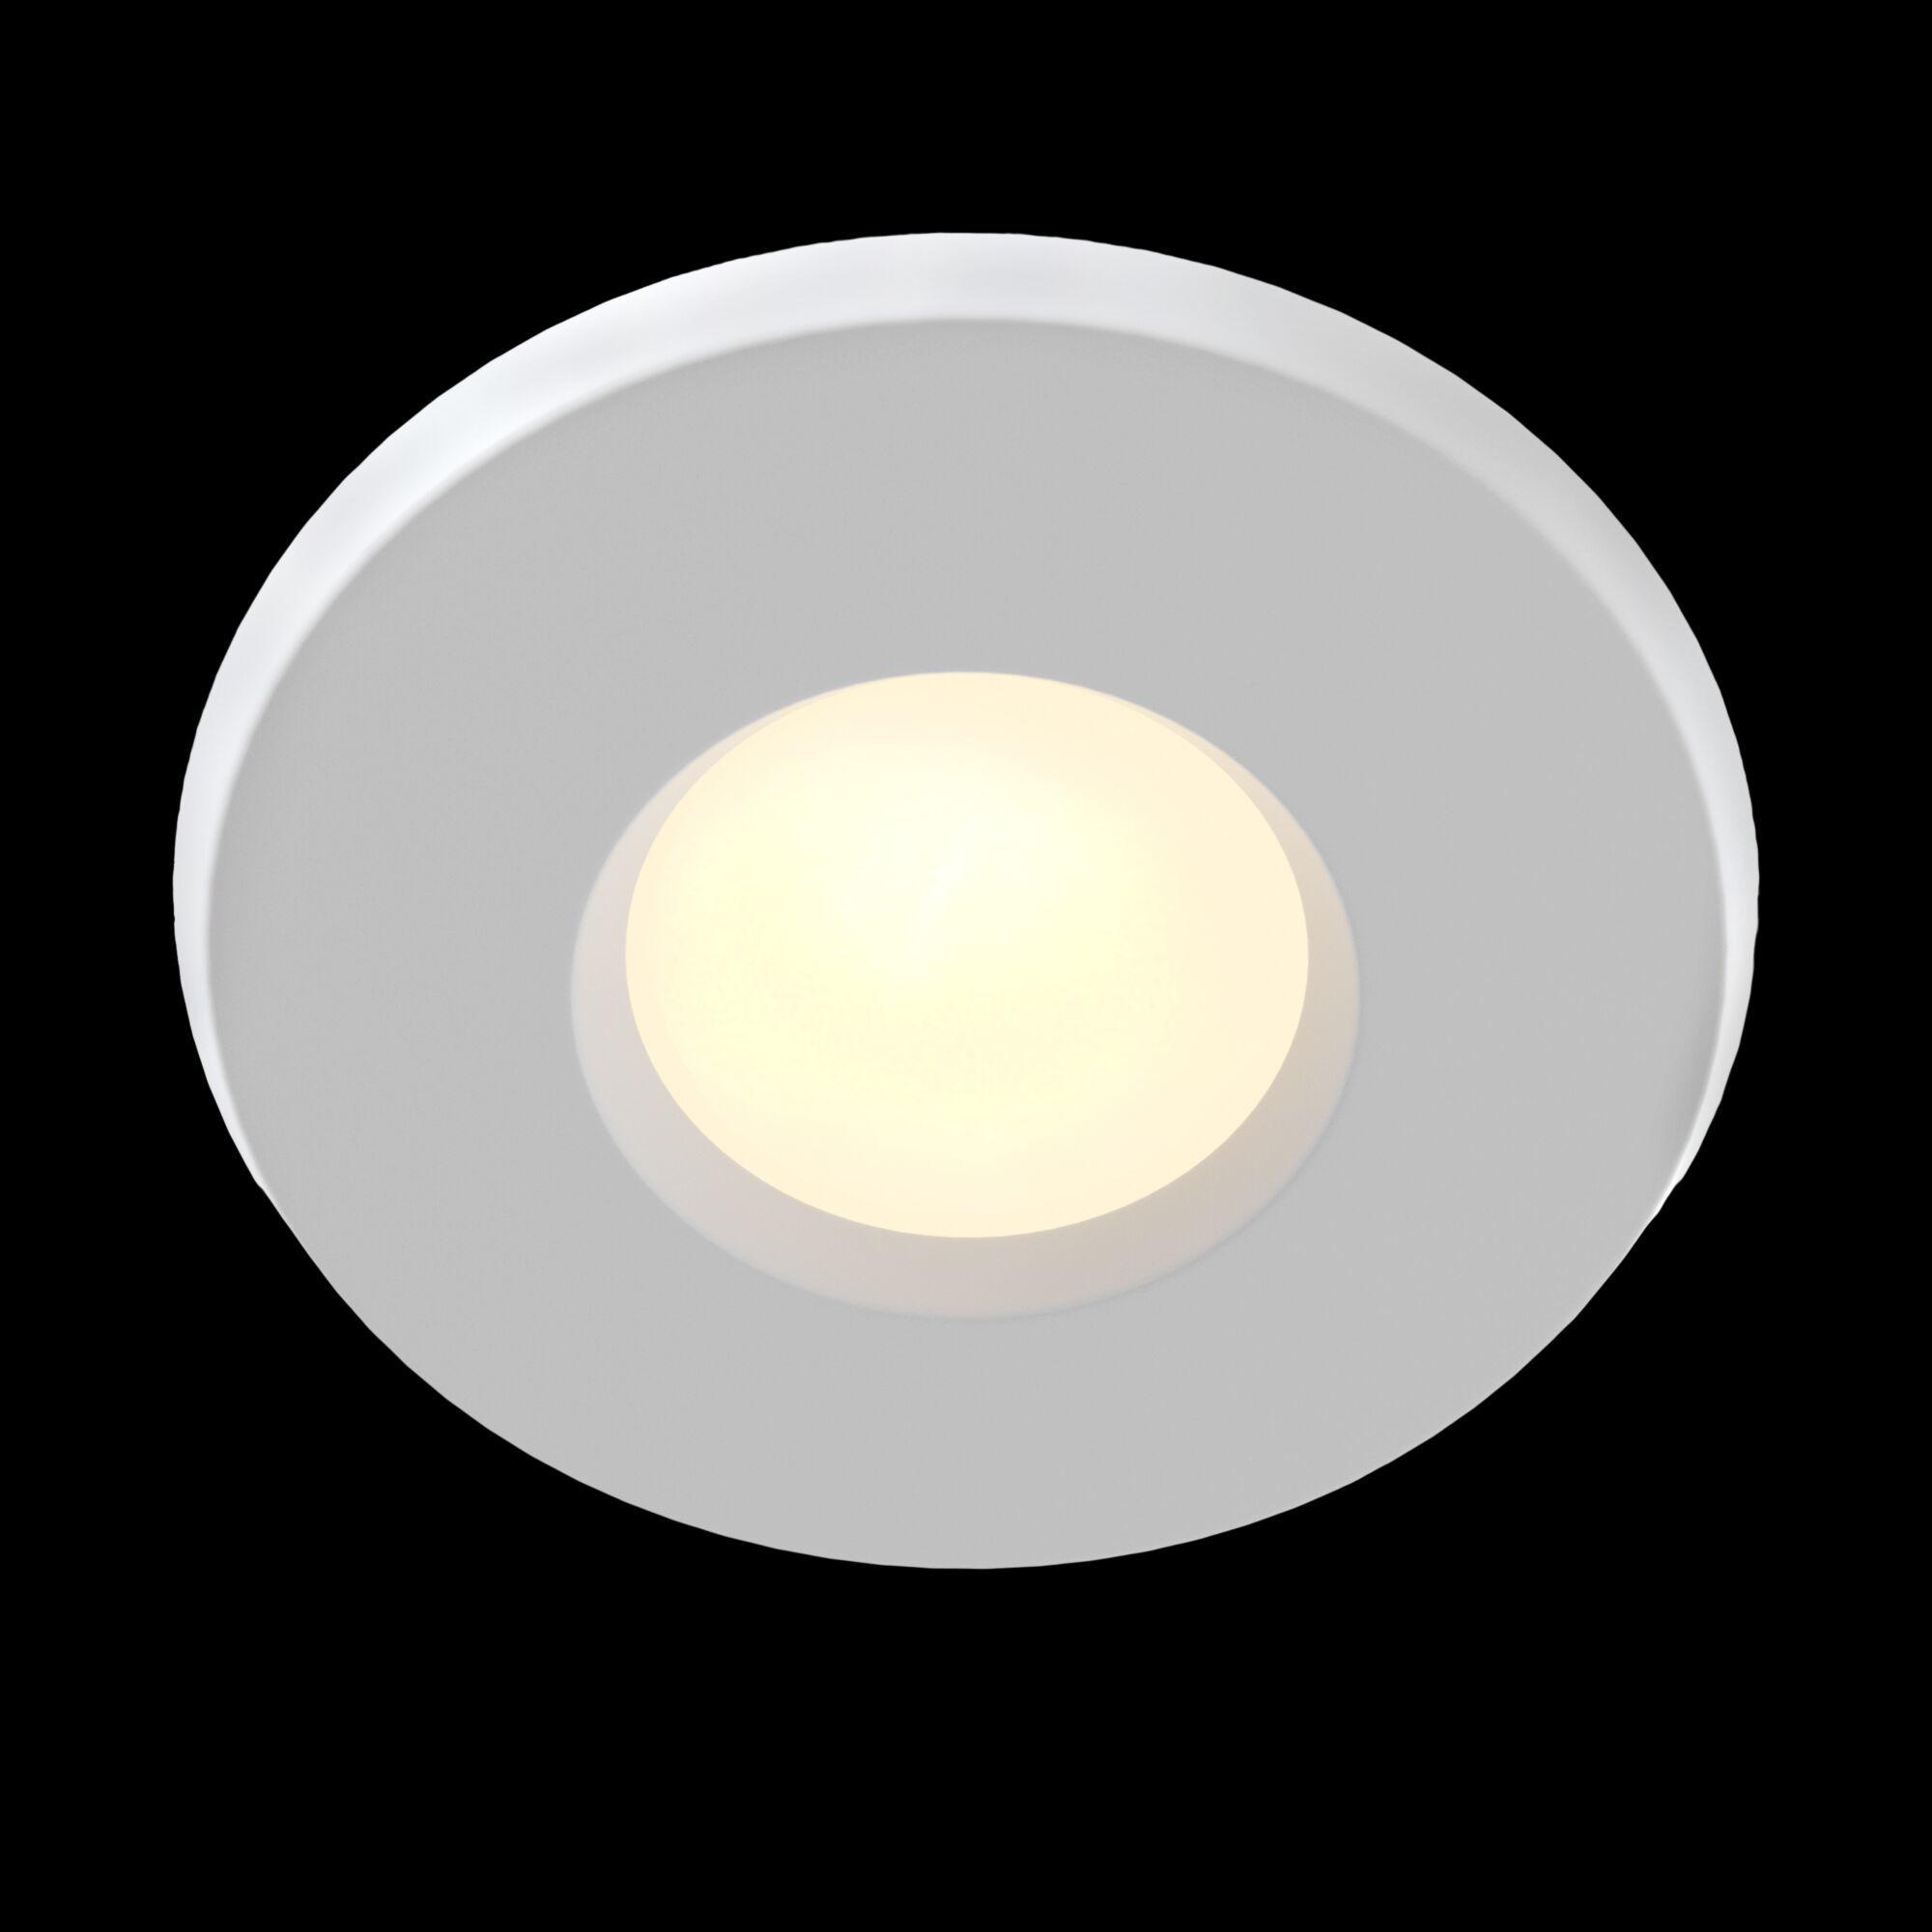 Встраиваемый светильник Maytoni Metal Modern DL010-3-01-W, 1xGU10x50W, белый, металл, стекло - фото 2